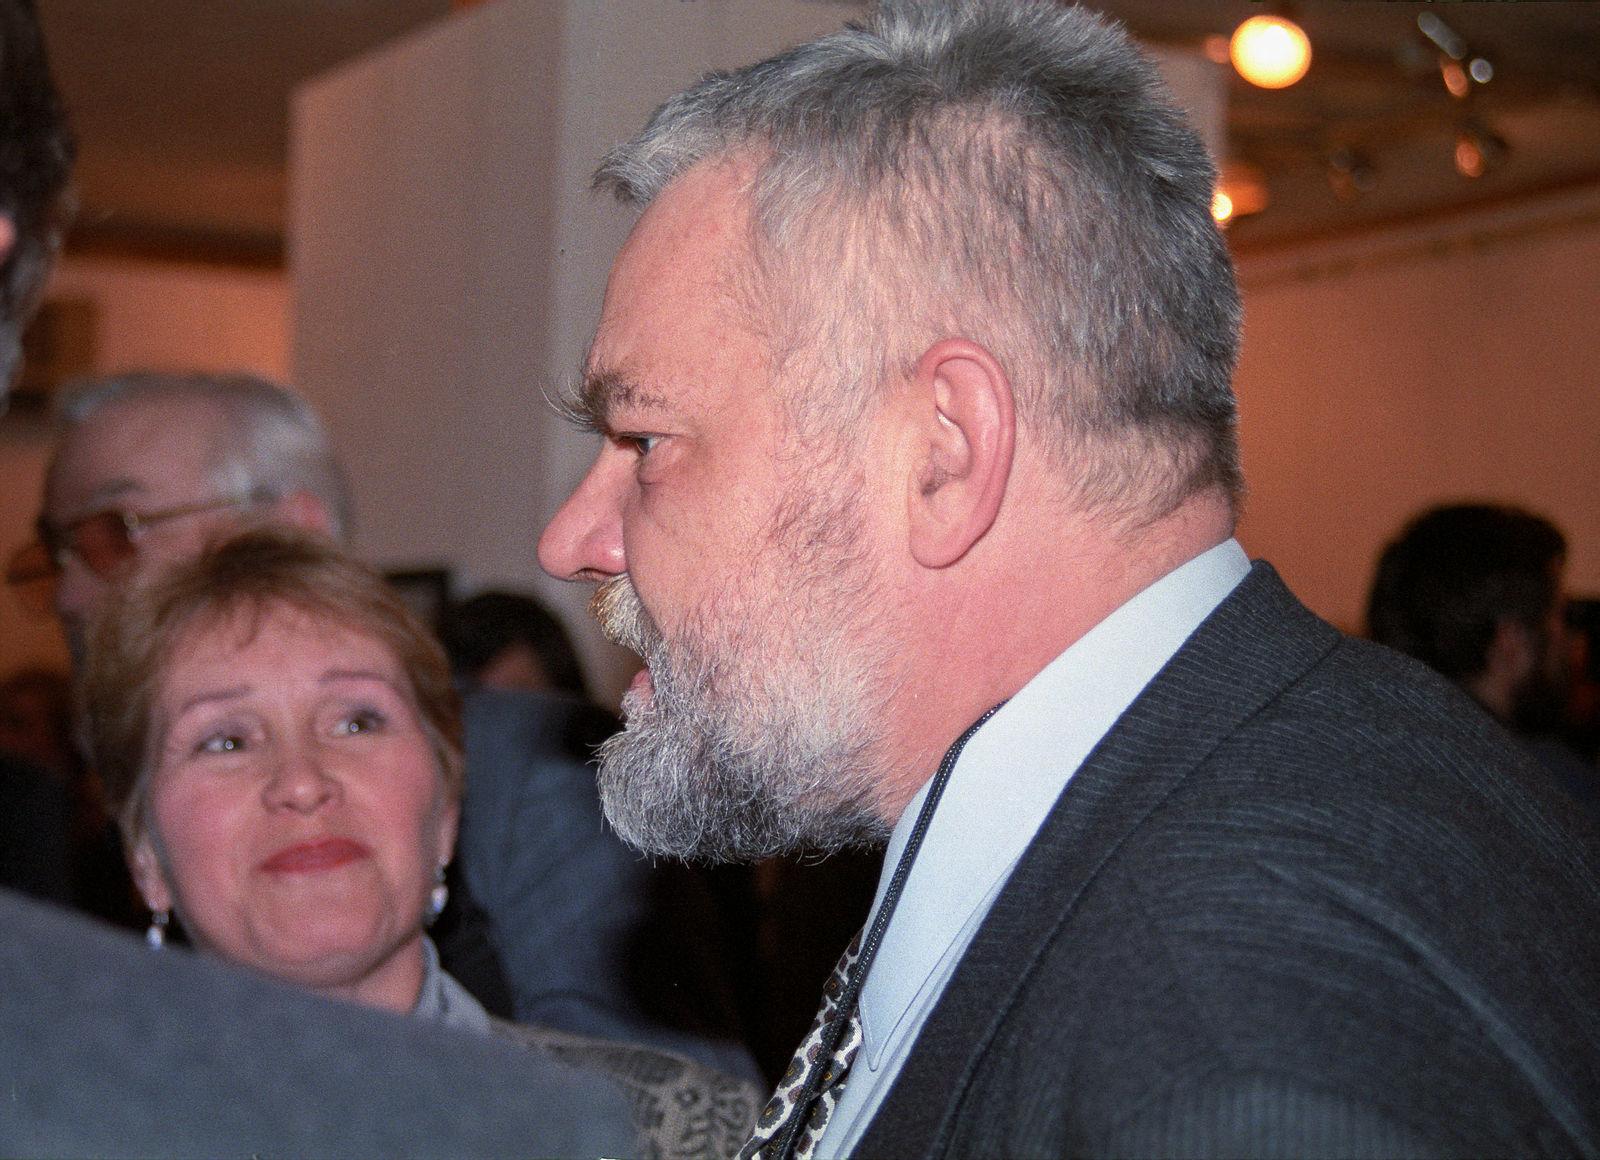 Image of Antanas Sutkus from Wikidata